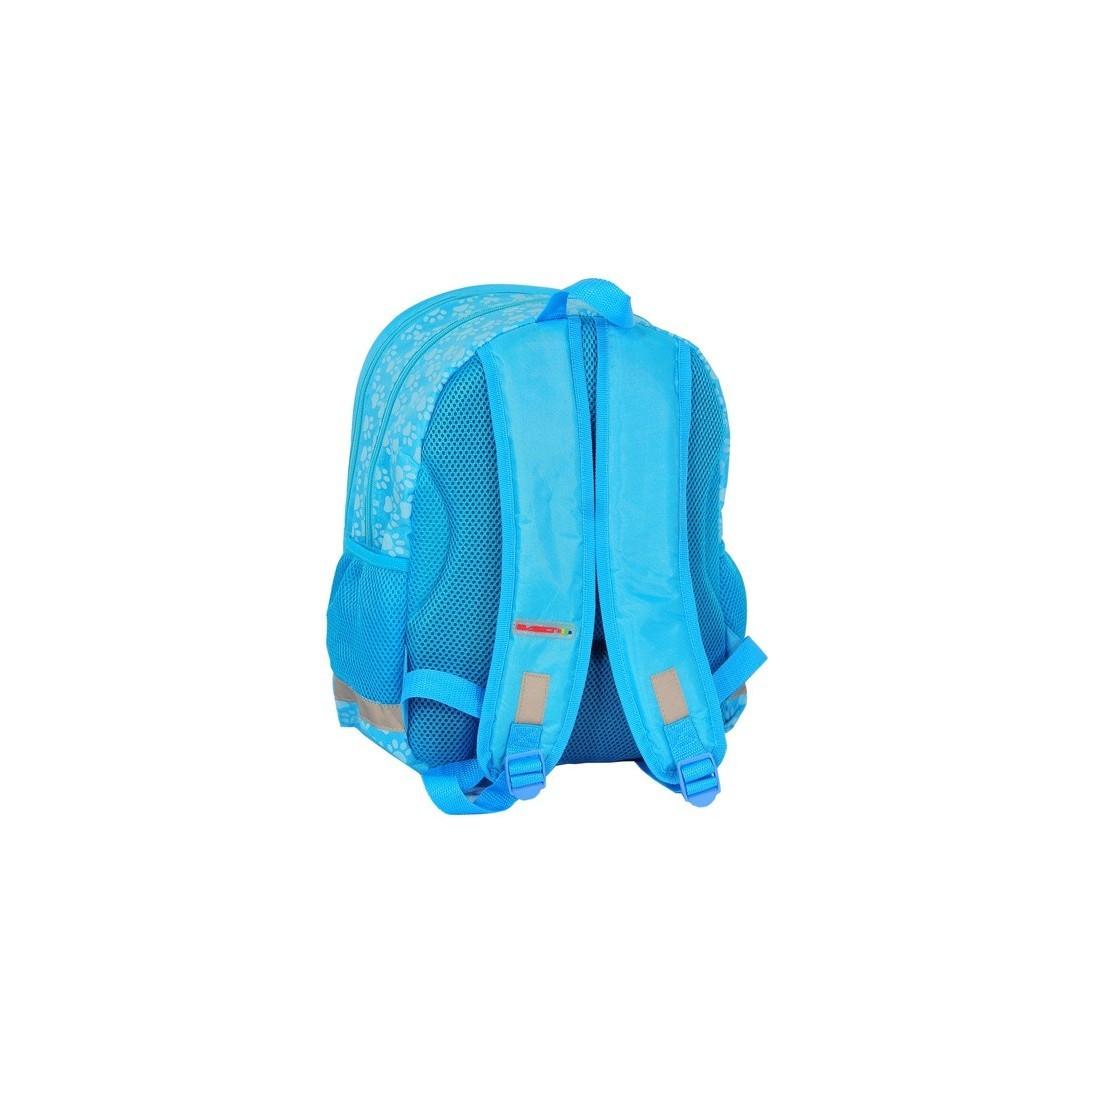 Plecak szkolny Rachael Hale niebieski z psem - plecak-tornister.pl